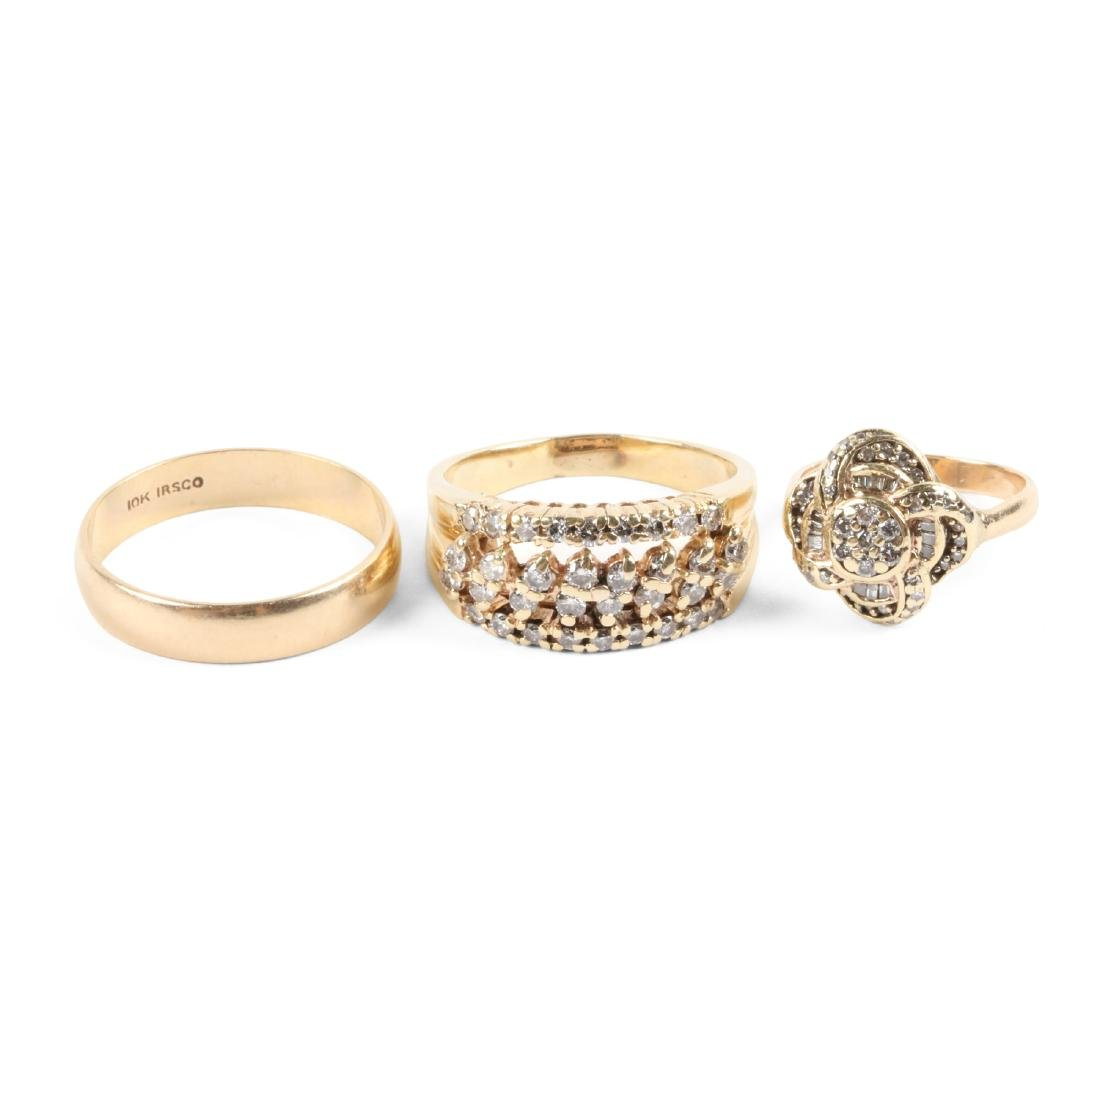 A Trio, 10K Gold & Diamond Rings